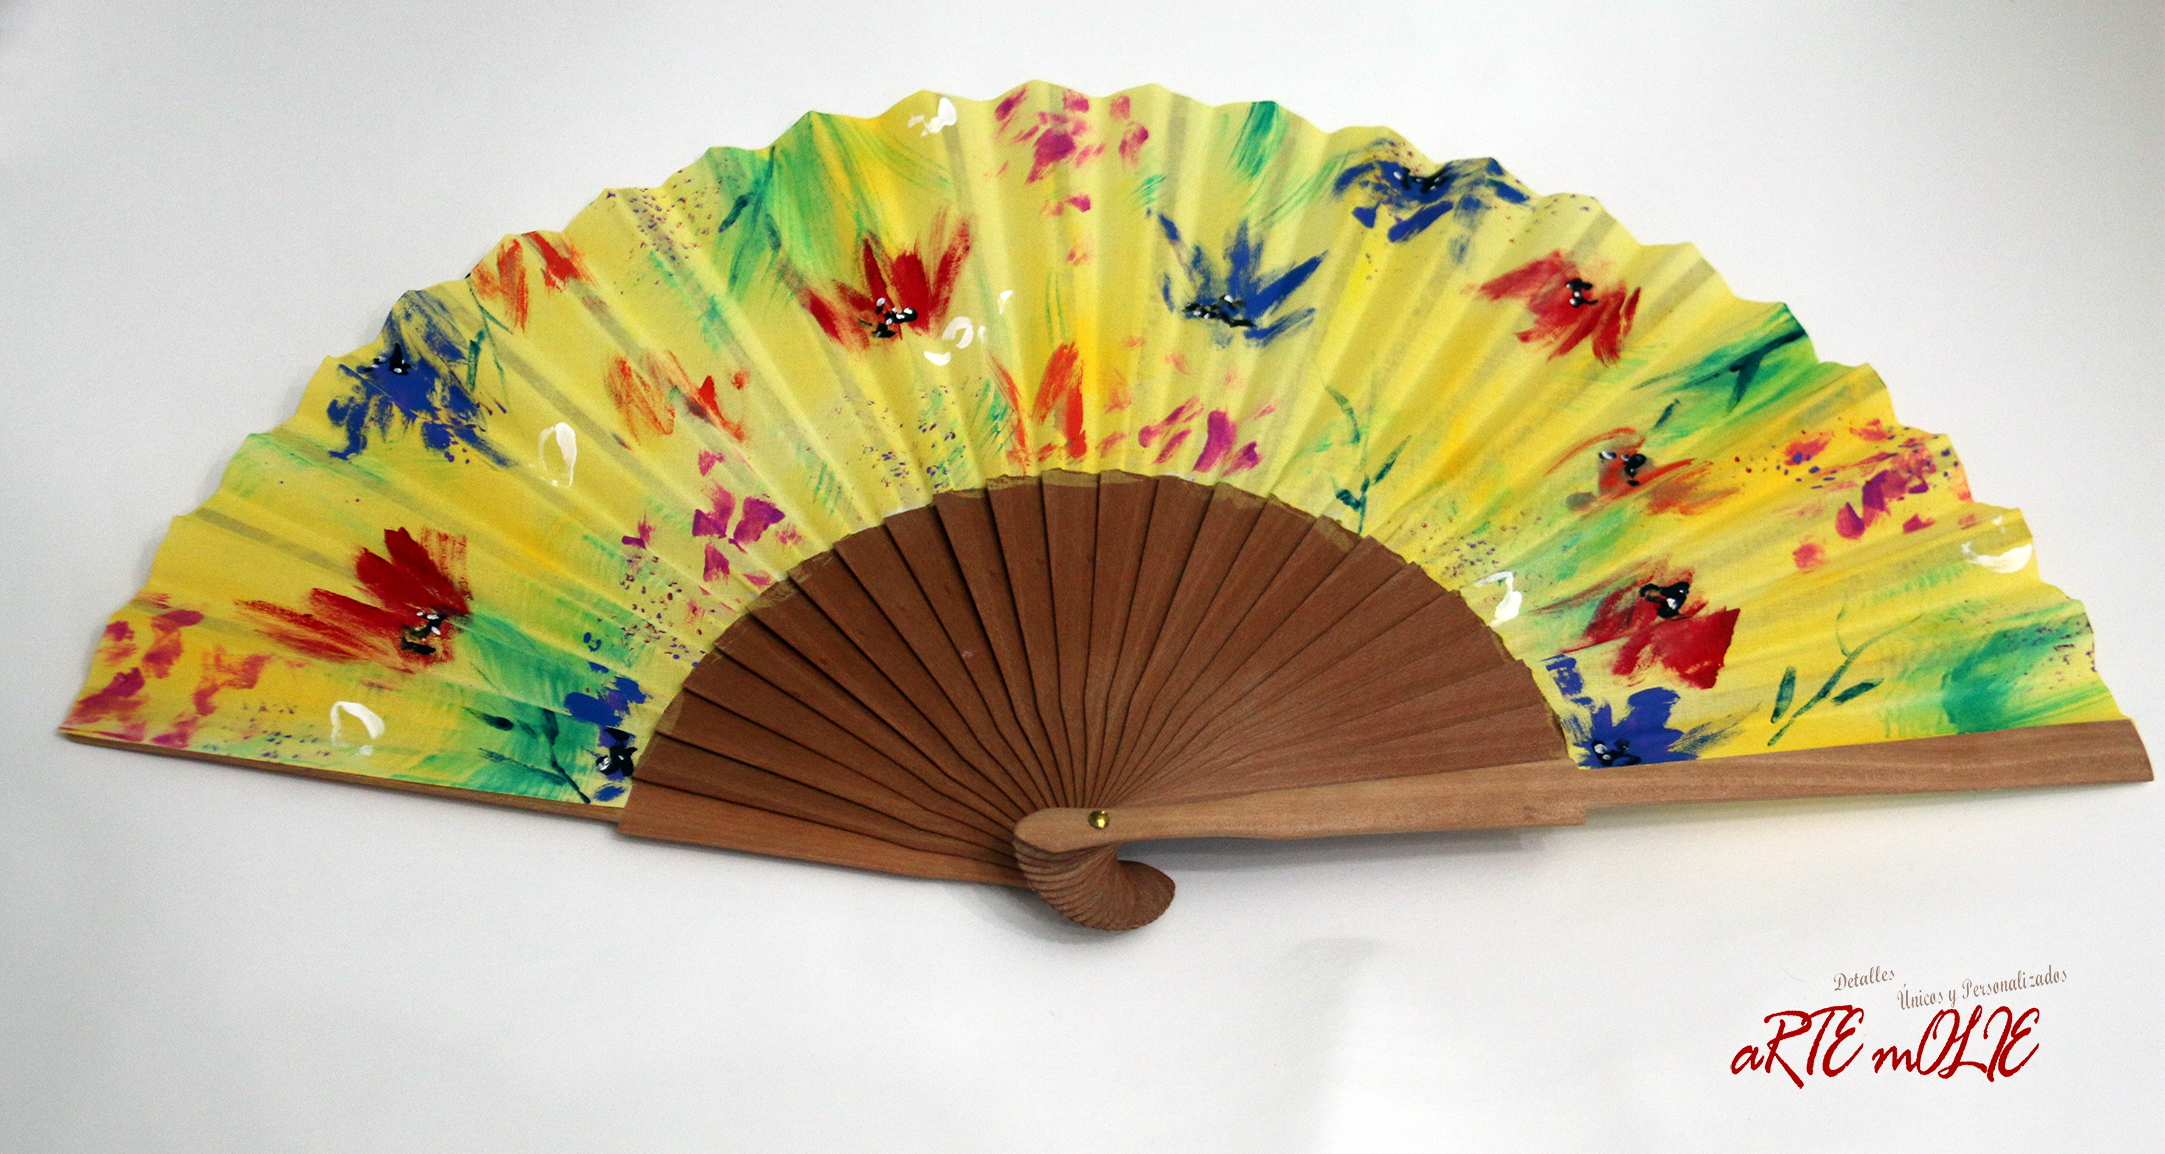 Abanico pintado a mano con diseño Explosión de color